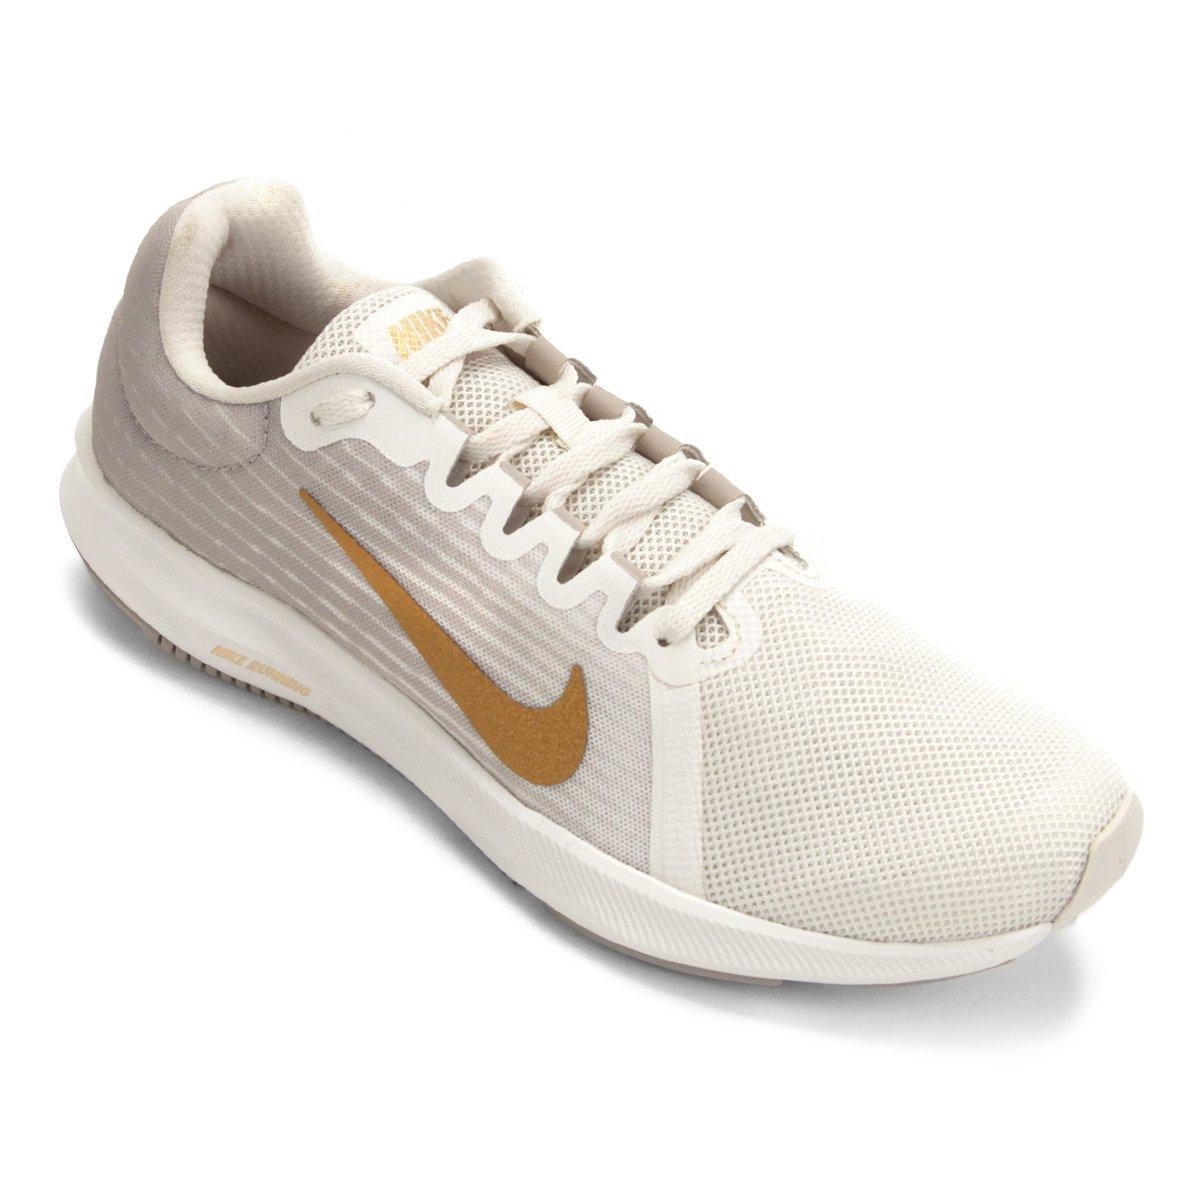 44d4e7bd Tênis Nike Wmns Downshifter 8 Feminino - Cinza e Dourado   Loja do Inter